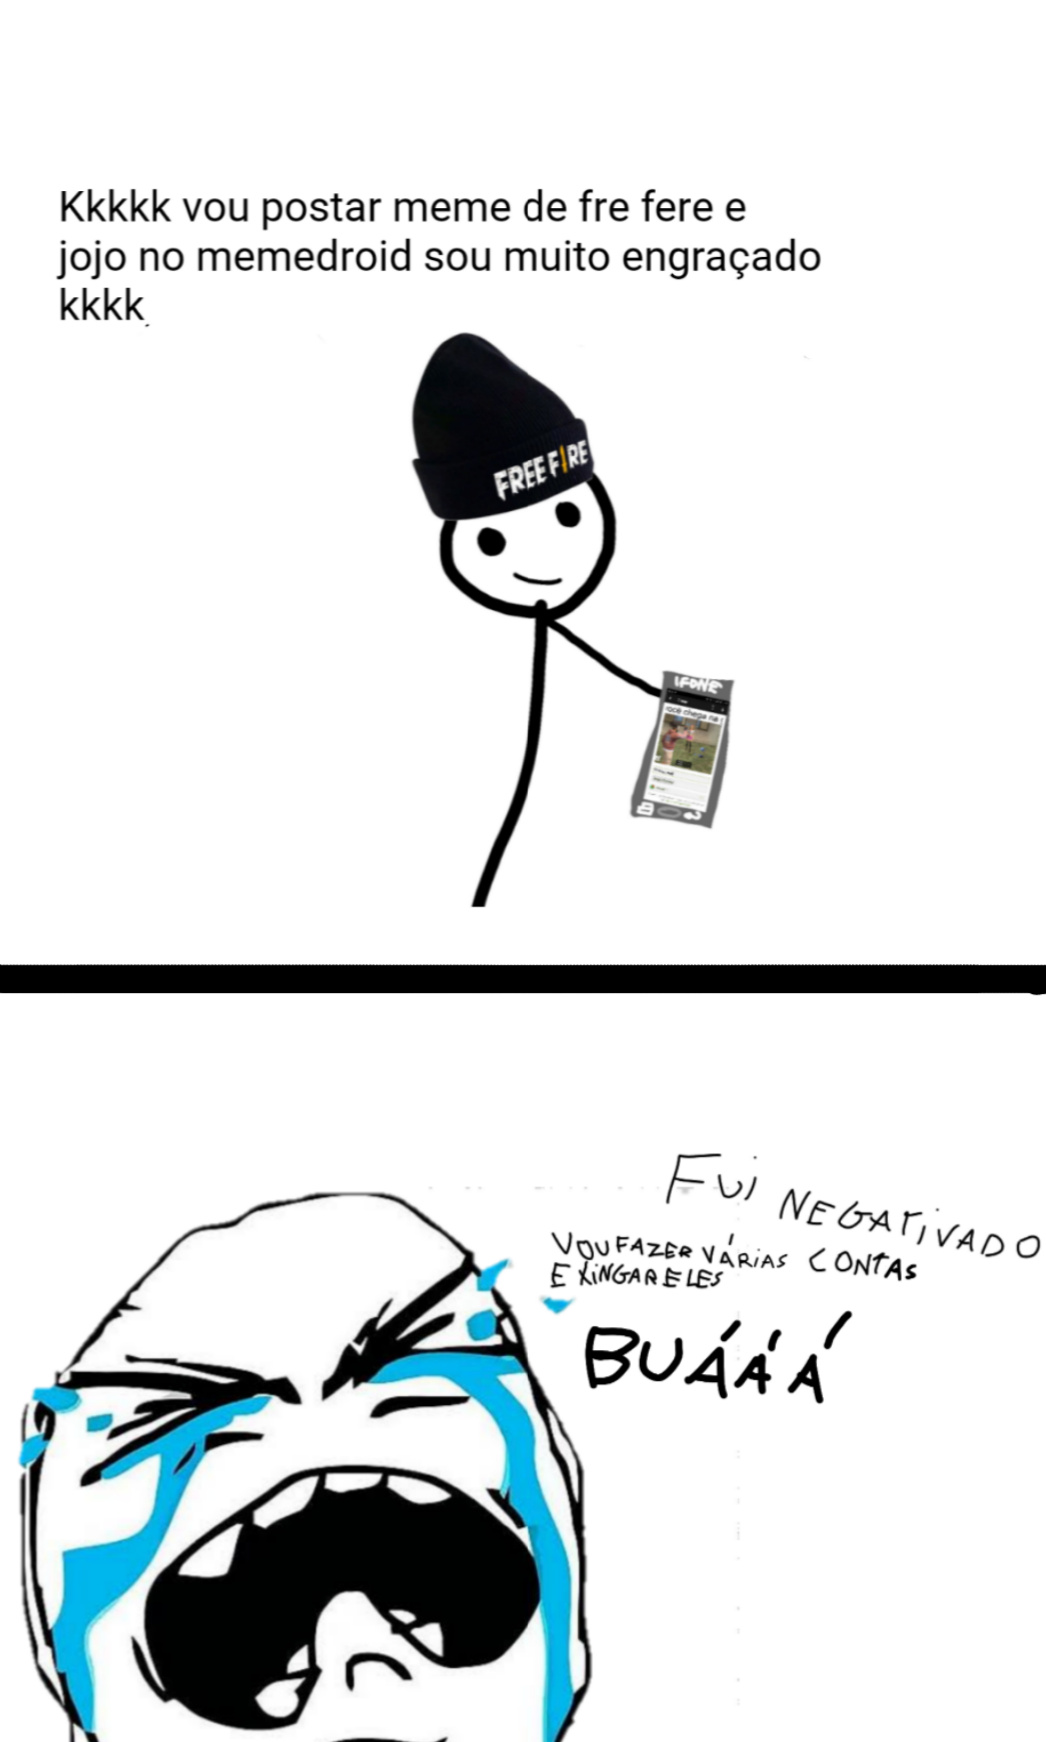 muto egracado - meme